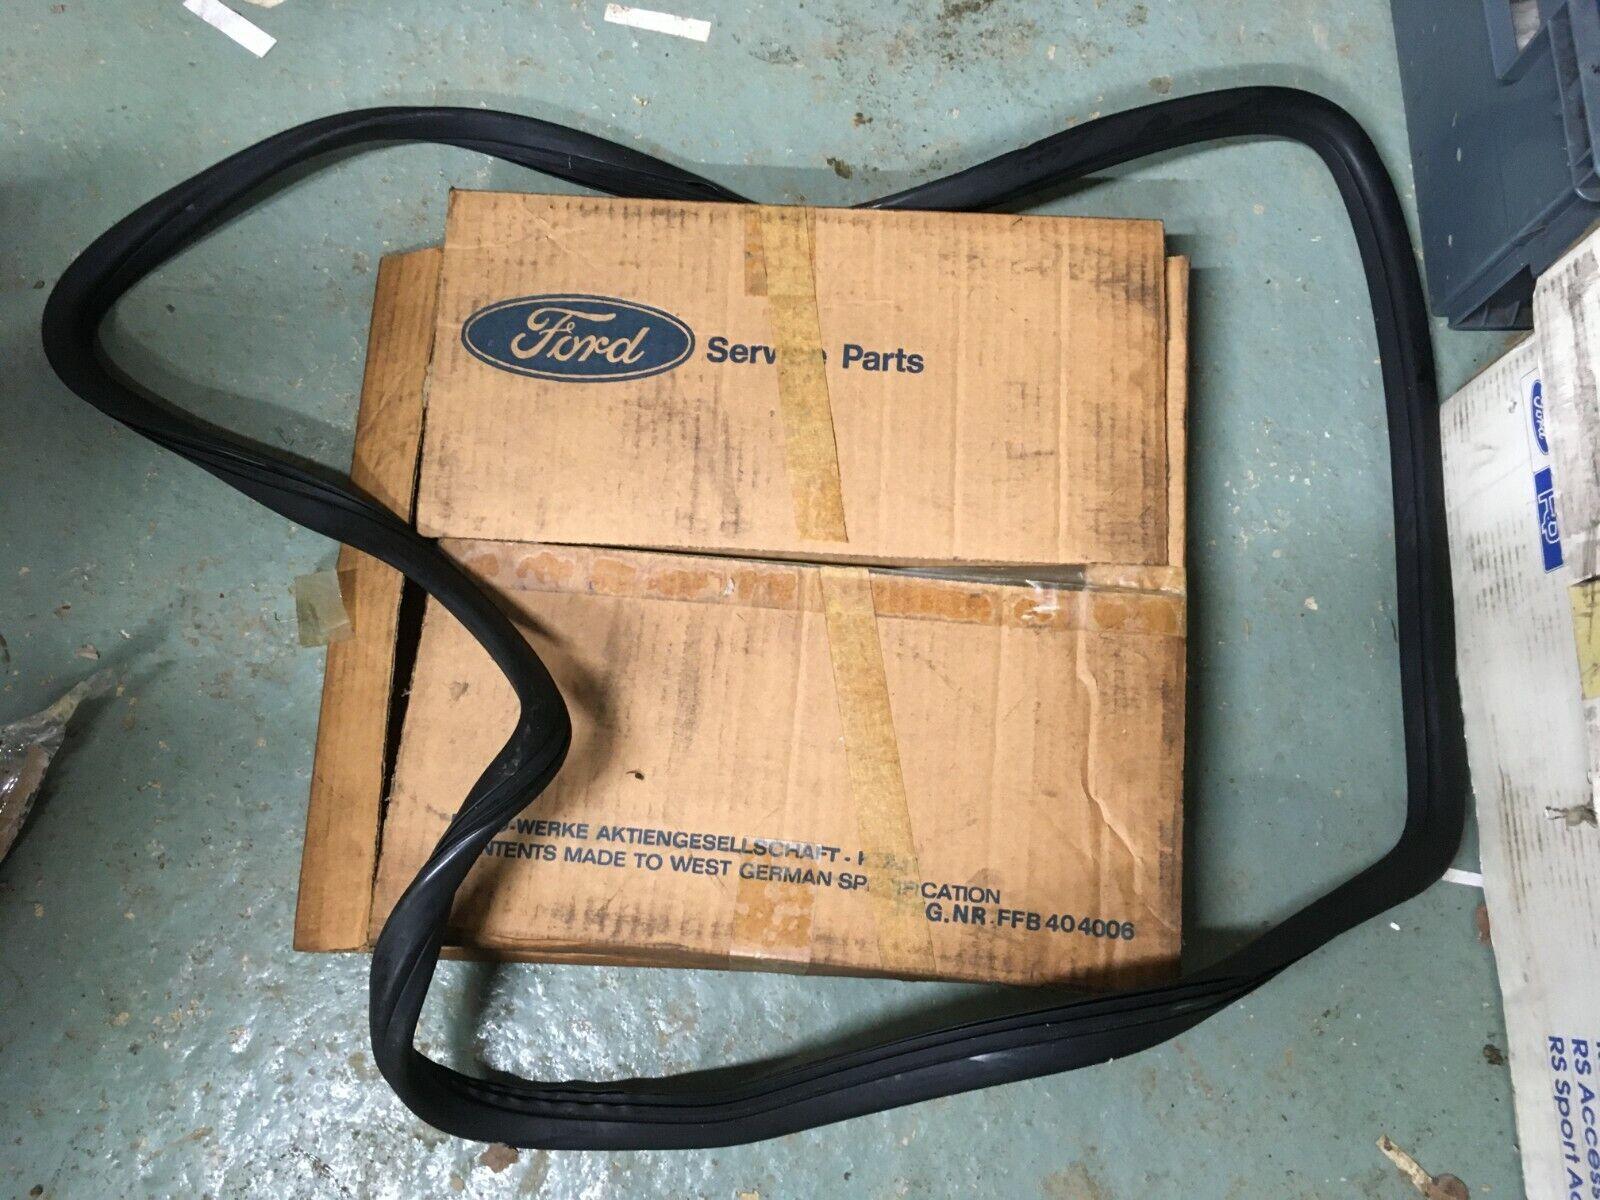 Car Parts - Ford Transit MK1 New Genuine Ford window weatherstrip